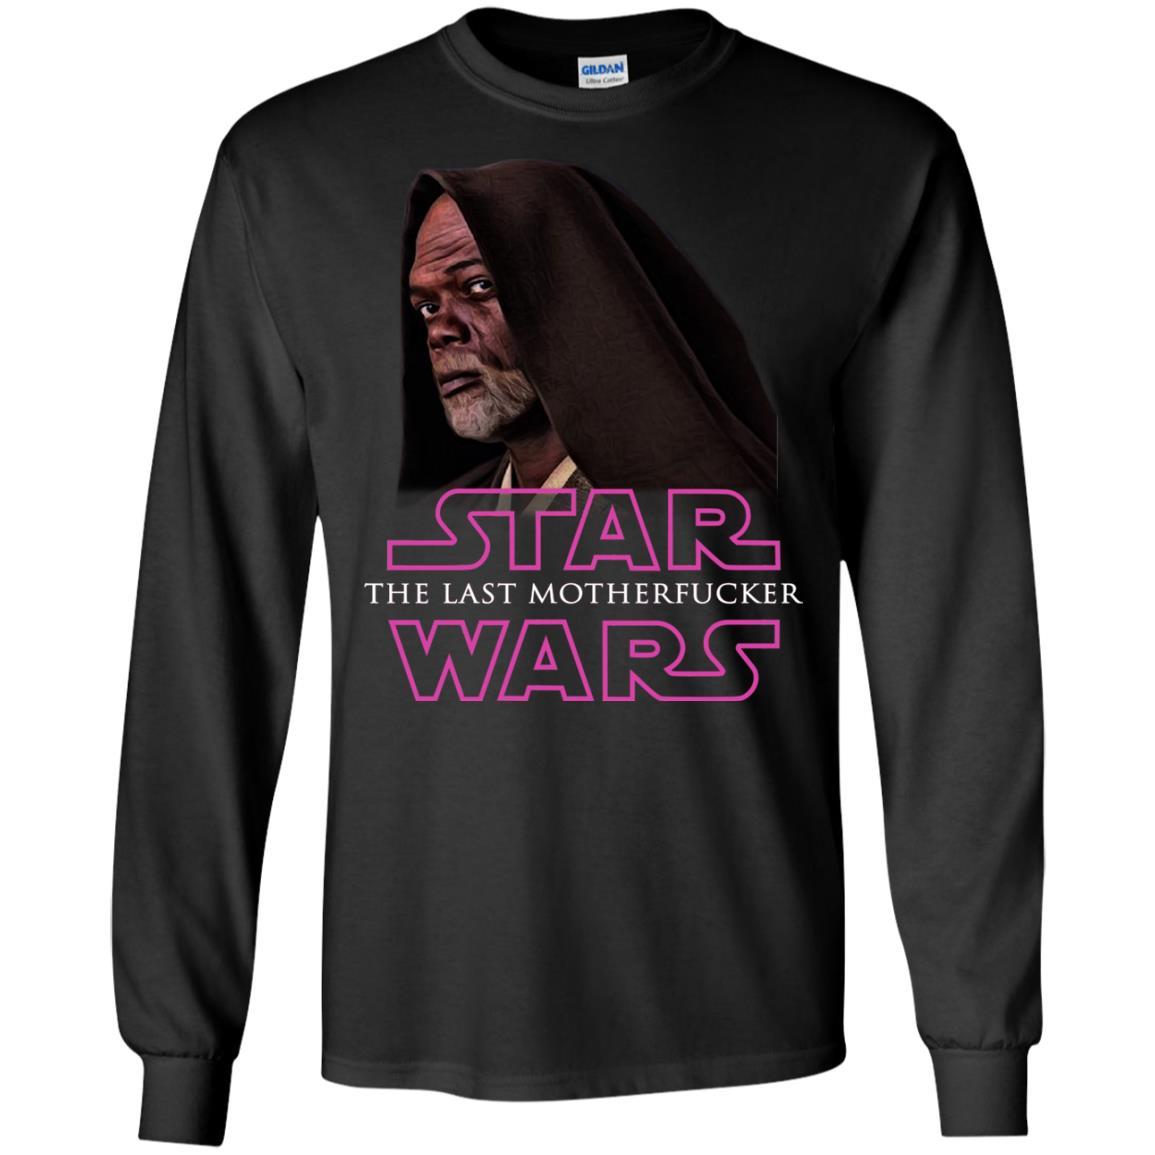 image 763 - Star The Last Motherfucker Wars Shirt, Sweatshirt, Hoodie